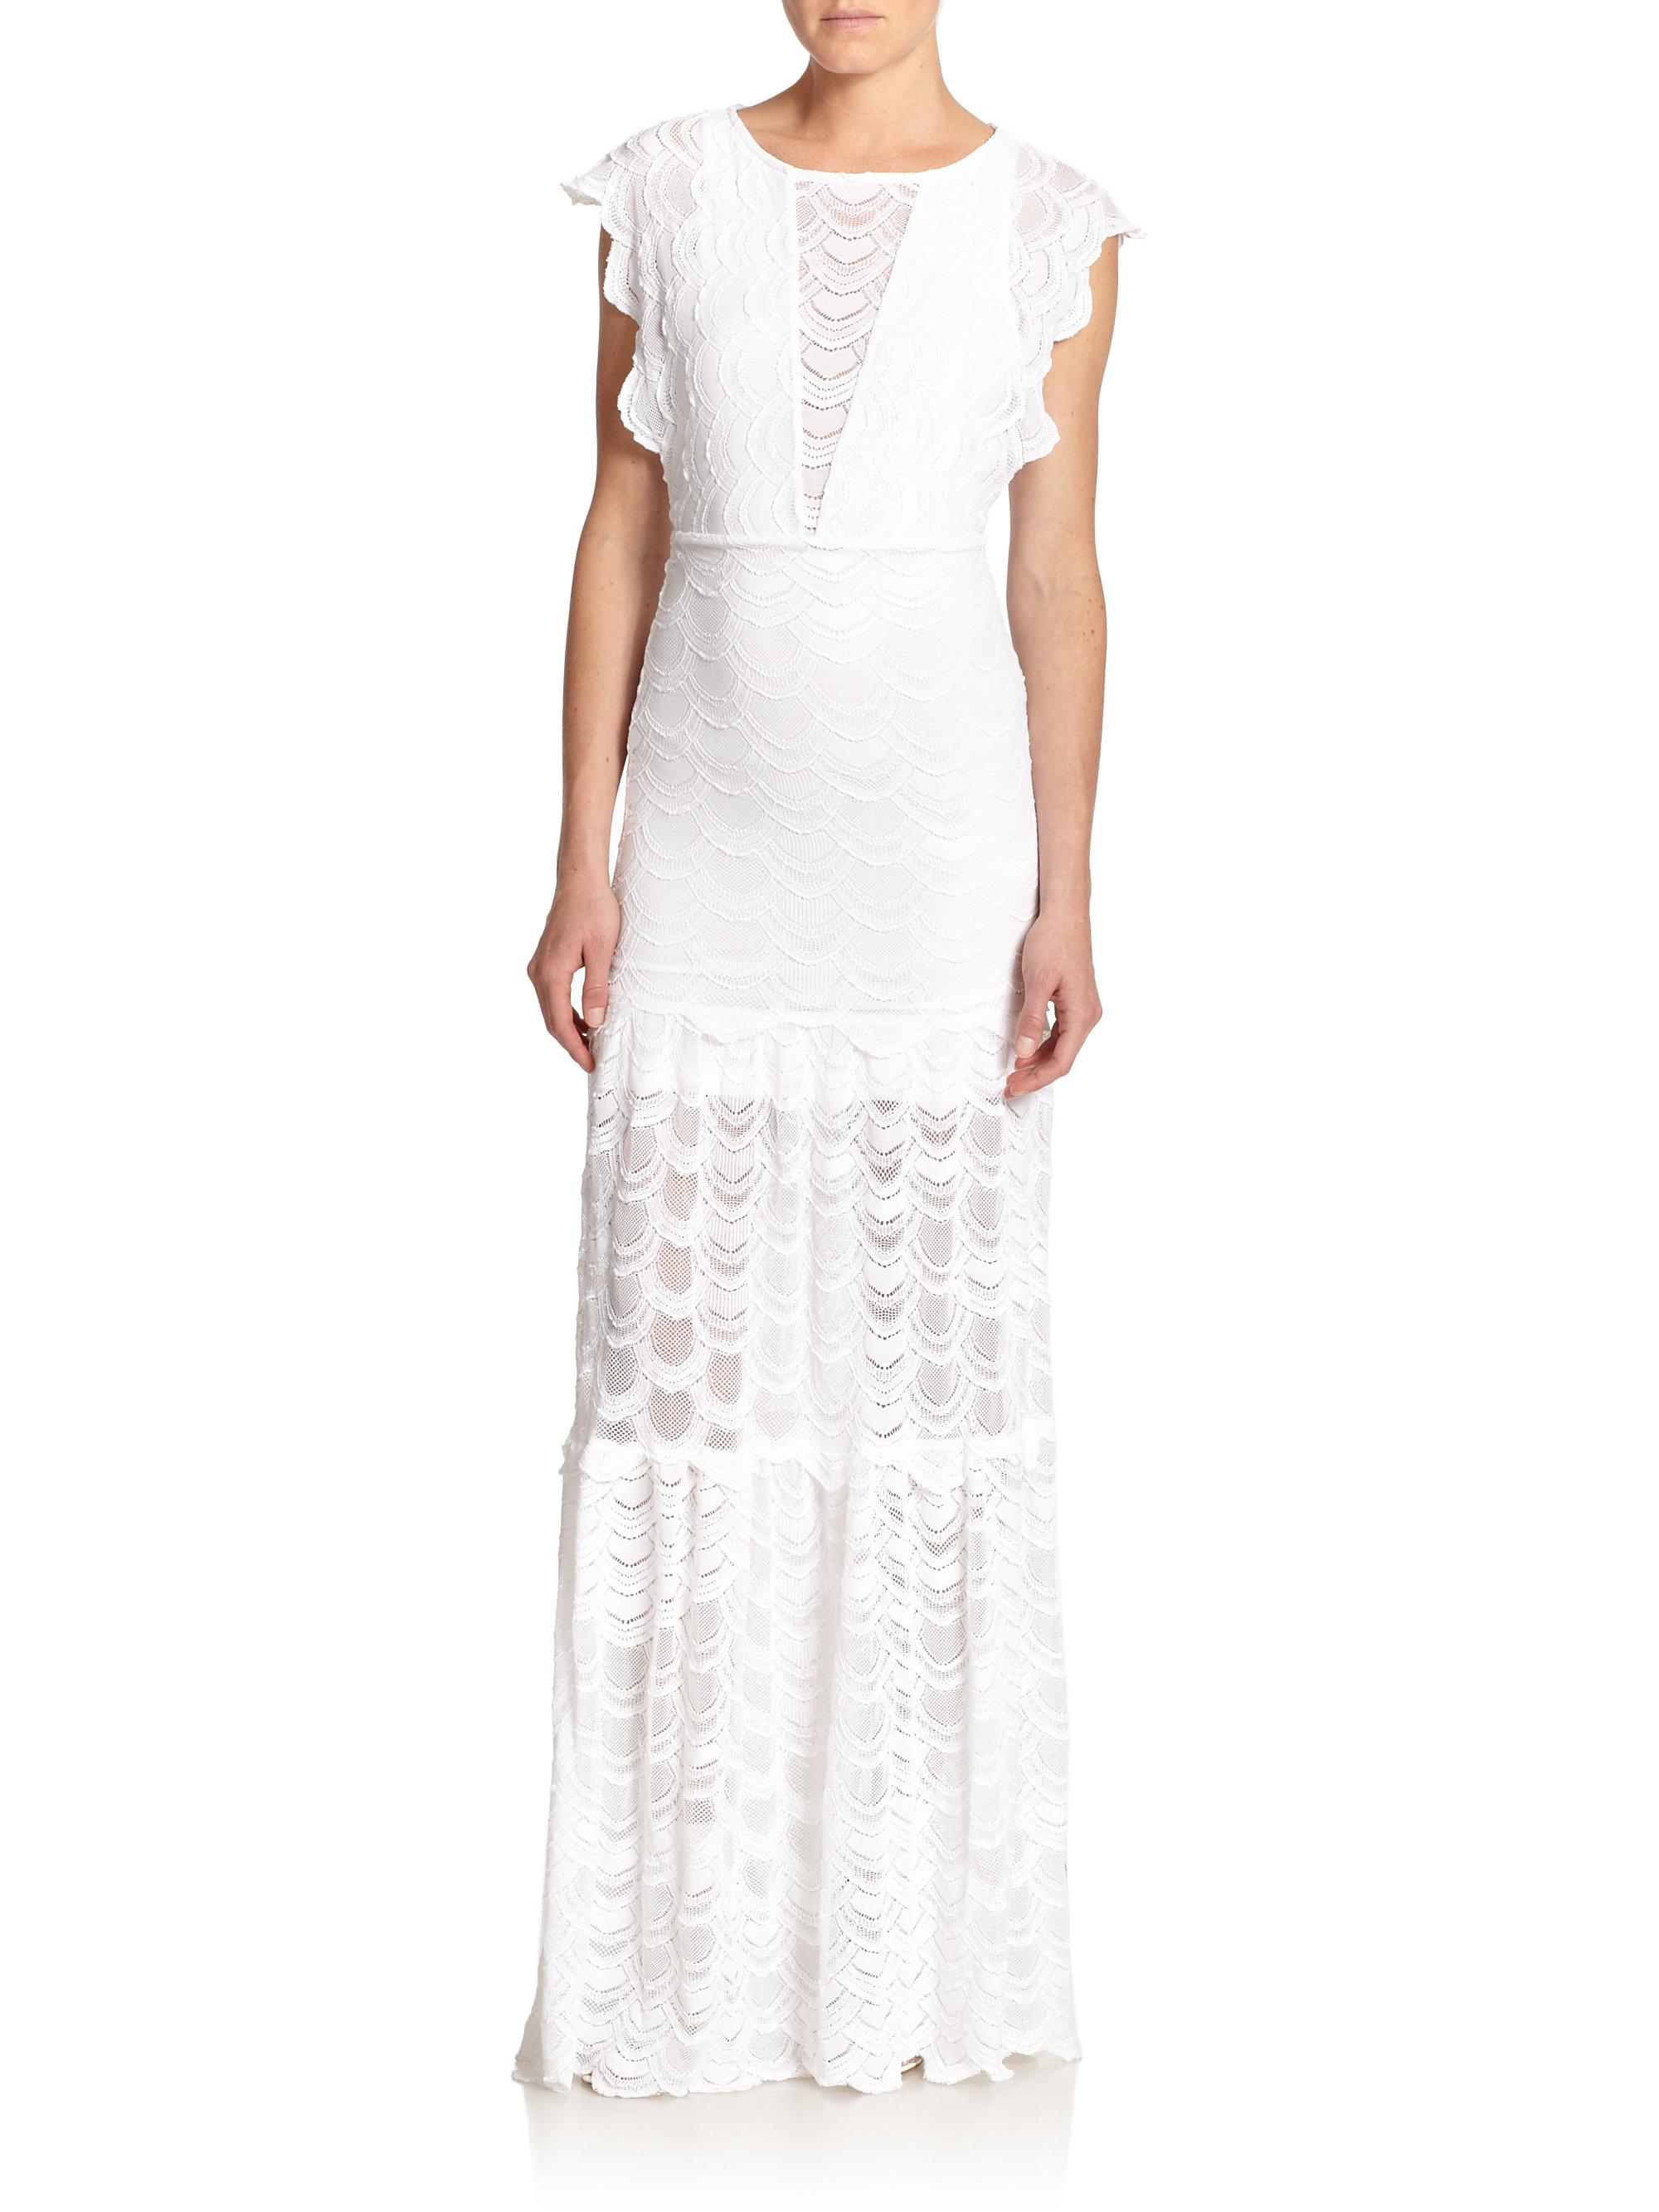 0e36dd0912efa Lyst - Nightcap Coletta Lace Gown in White